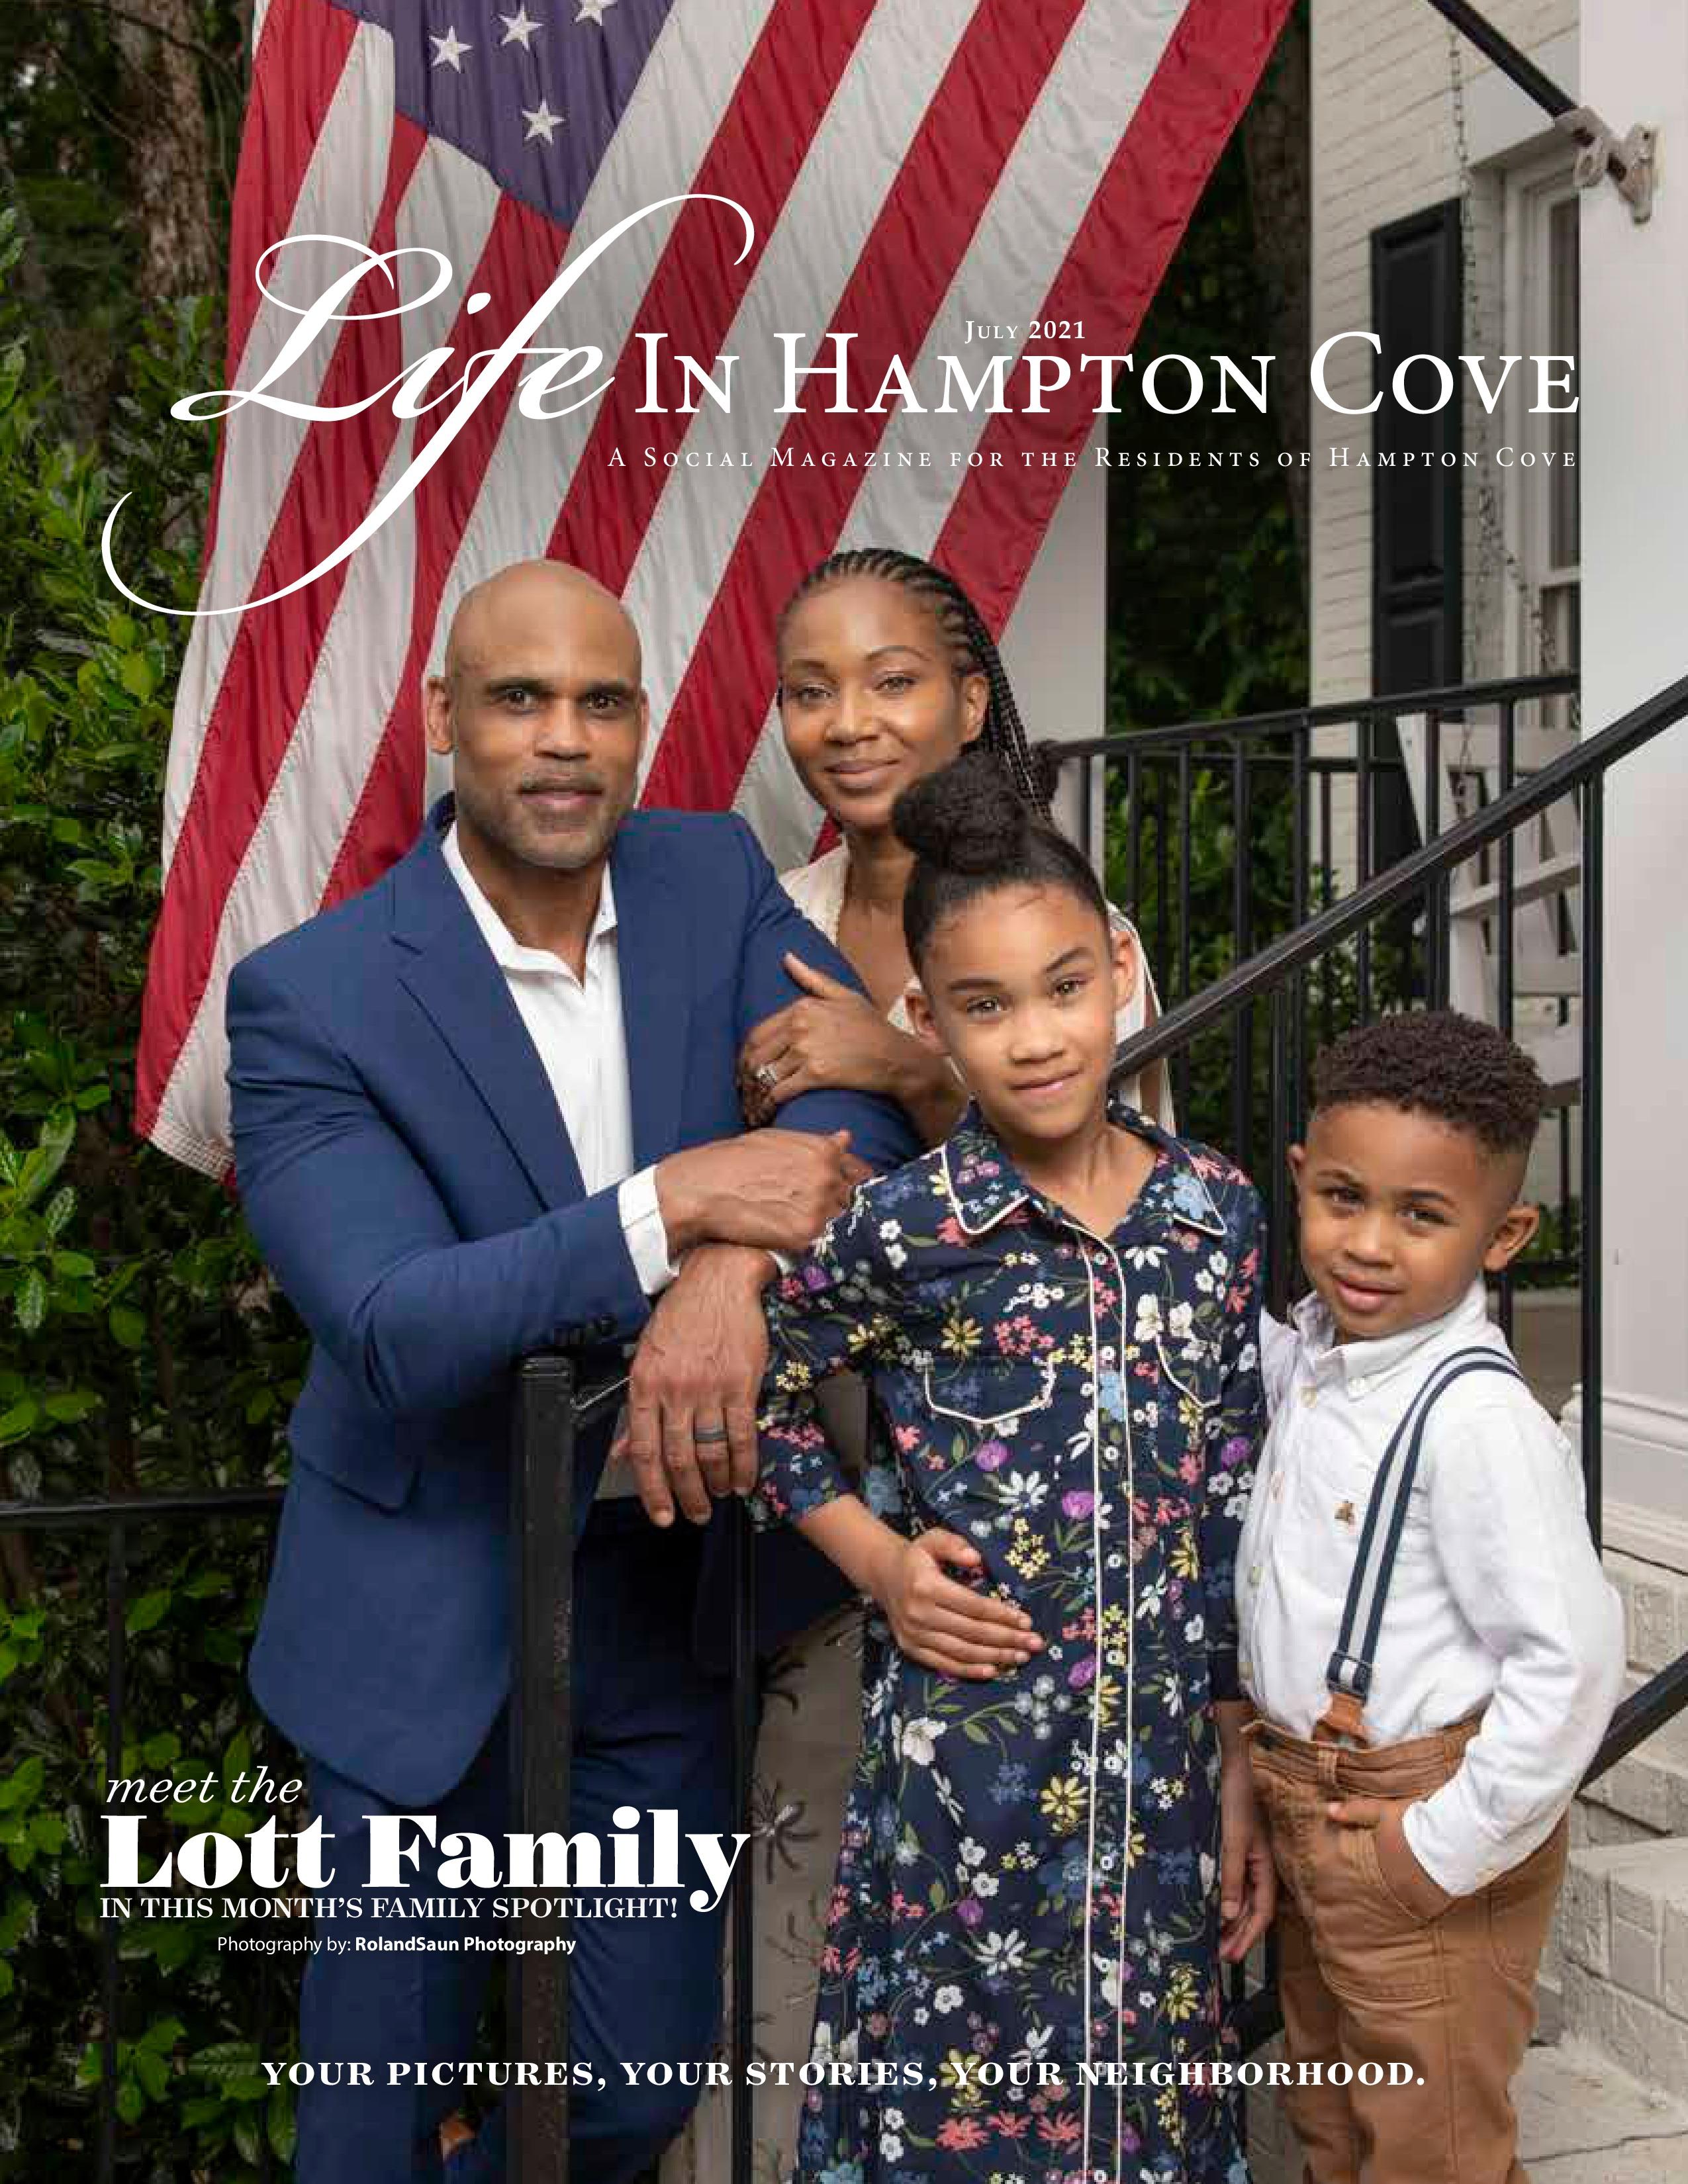 Life in Hampton Cove 2021-07-01